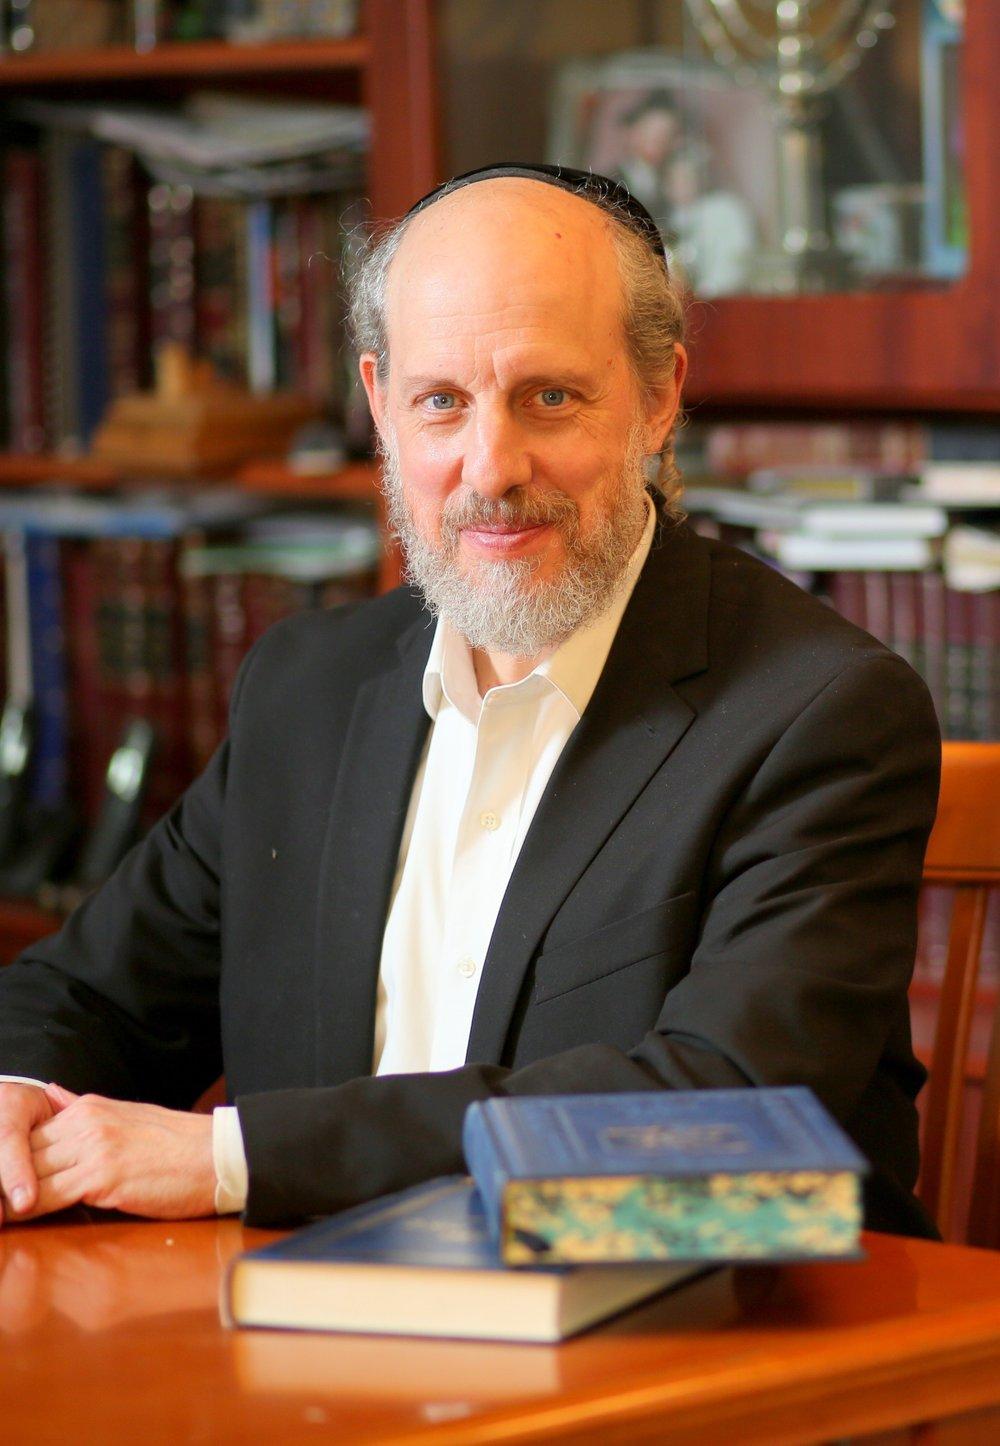 Rabbi Dr. Eliezer Shore